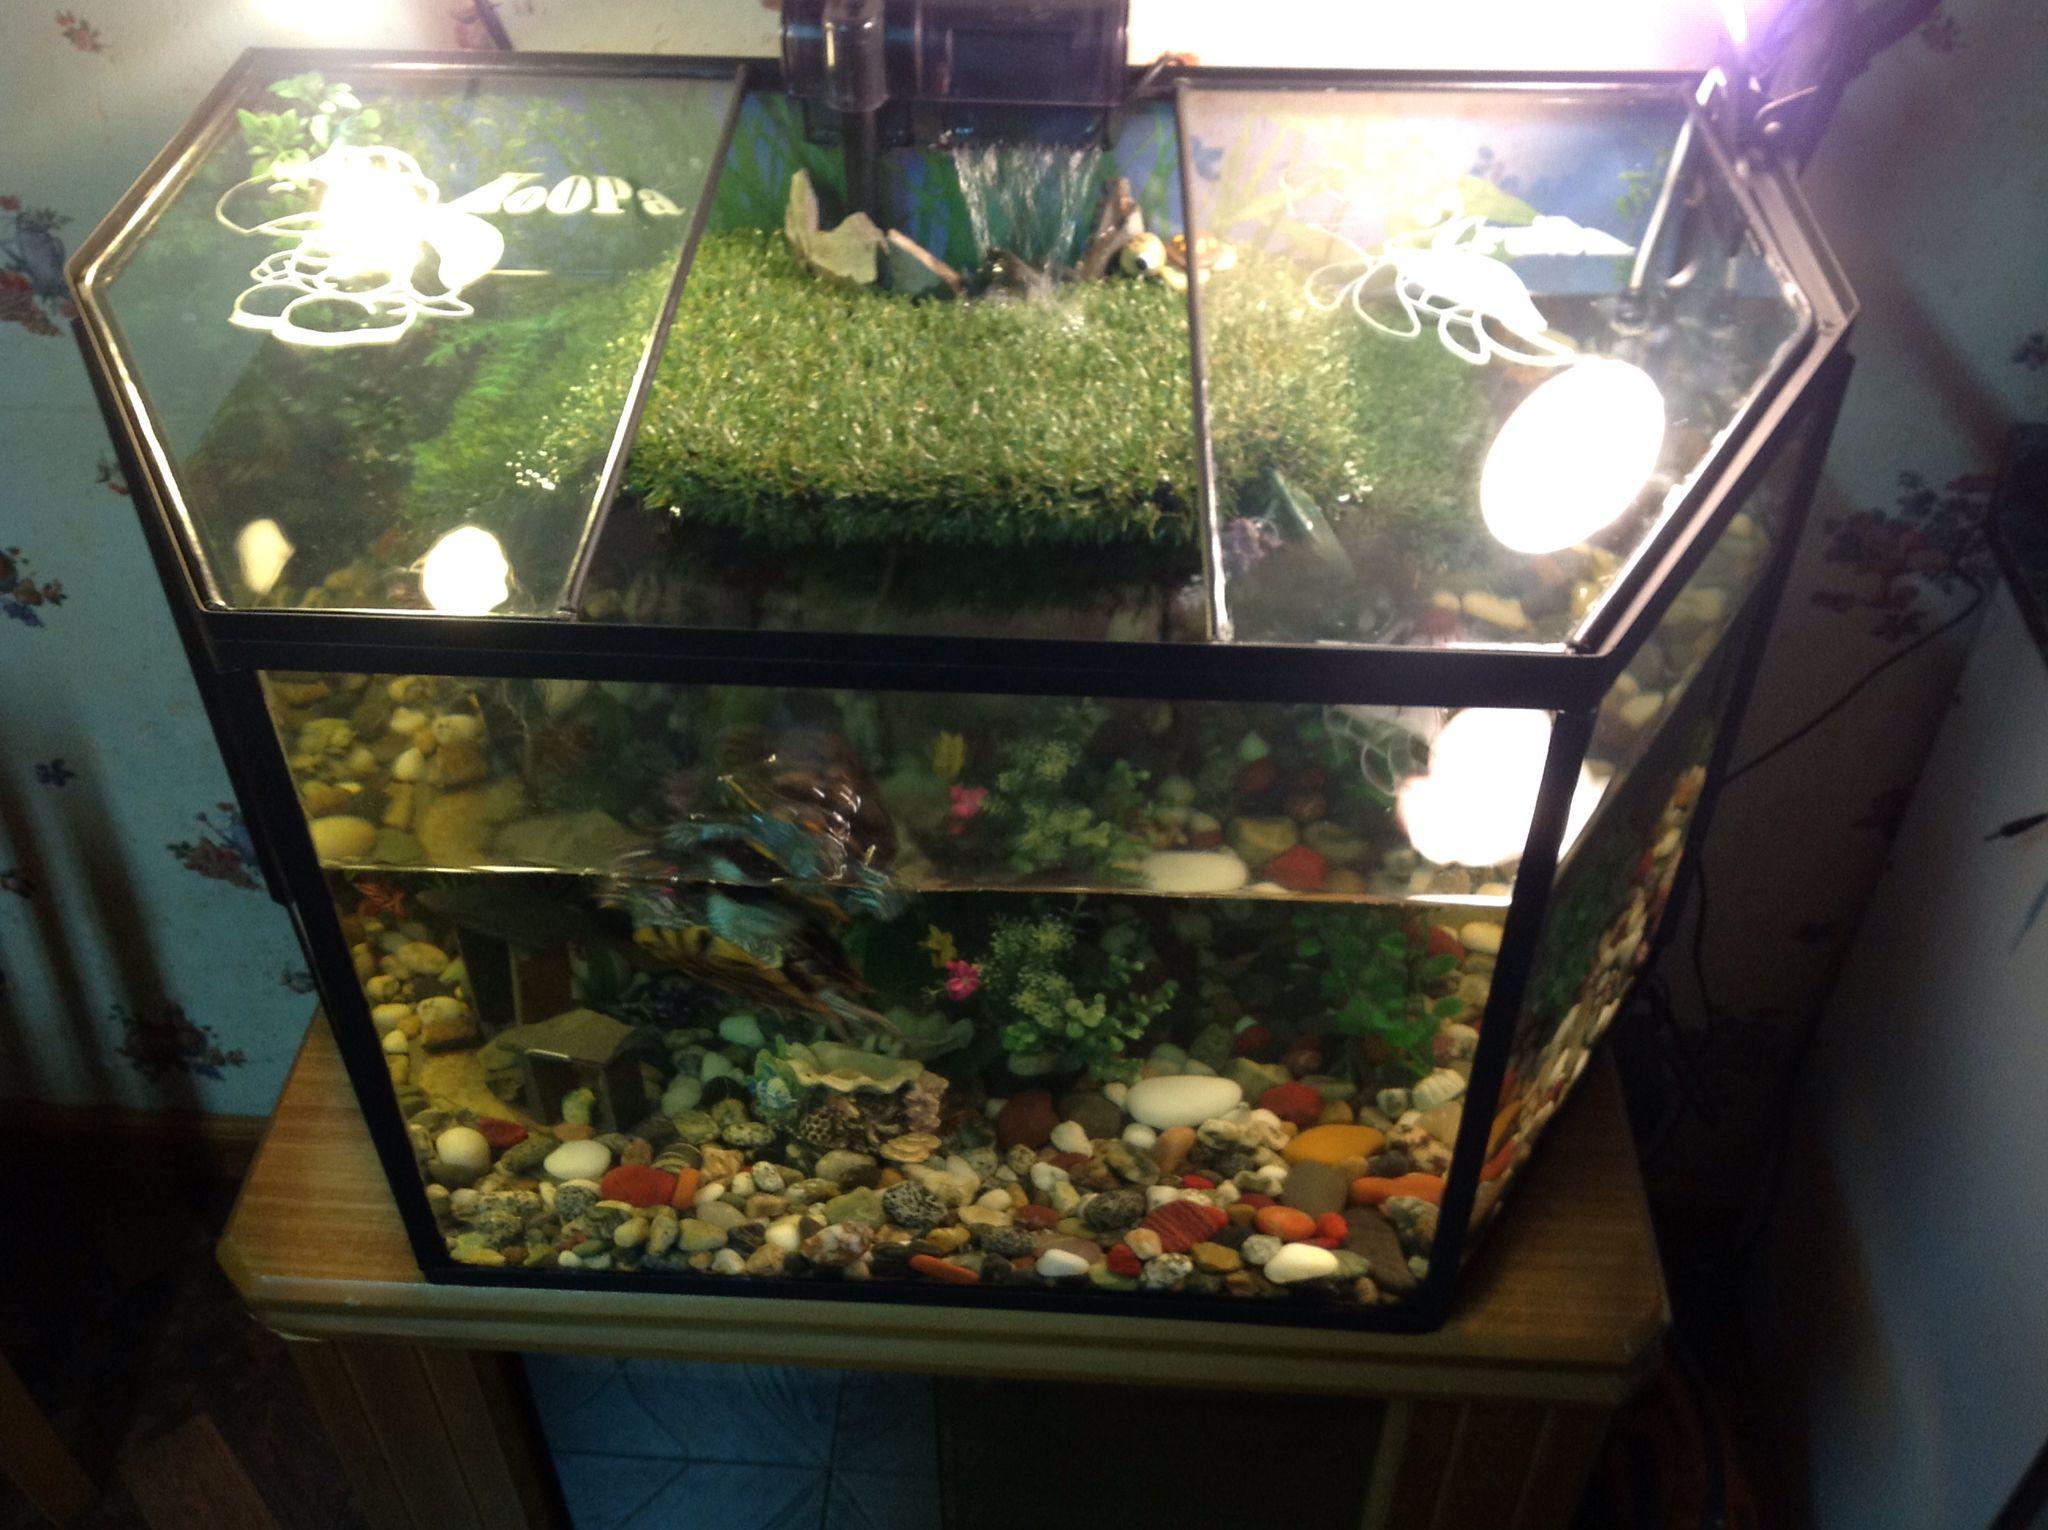 Tortuguera peceras pinterest peceras y tortugas for Peceras para tortugas